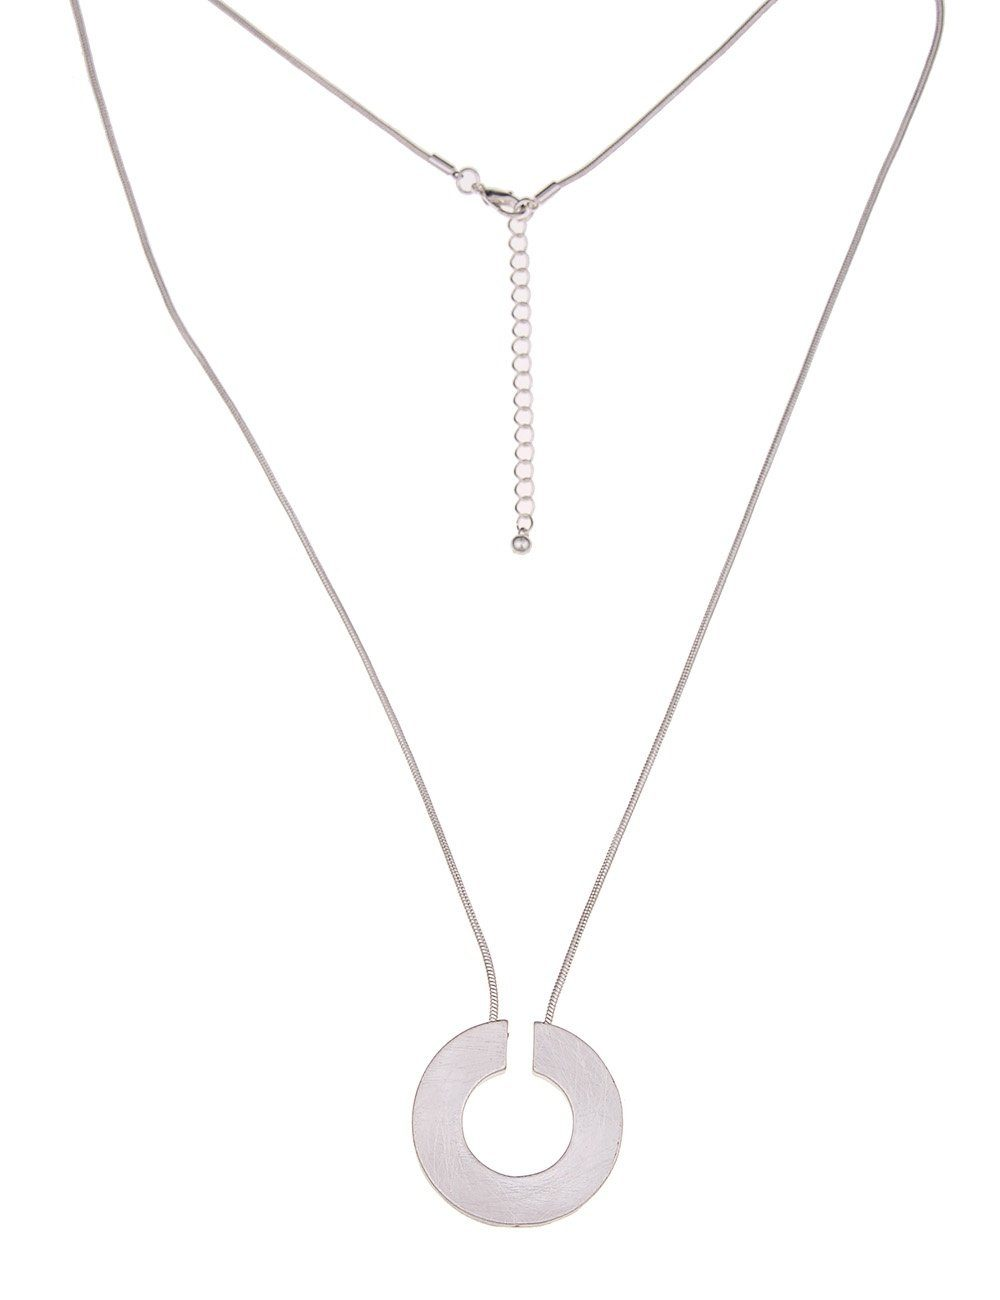 Leslii Schlangen-Halskette im Ring-Look